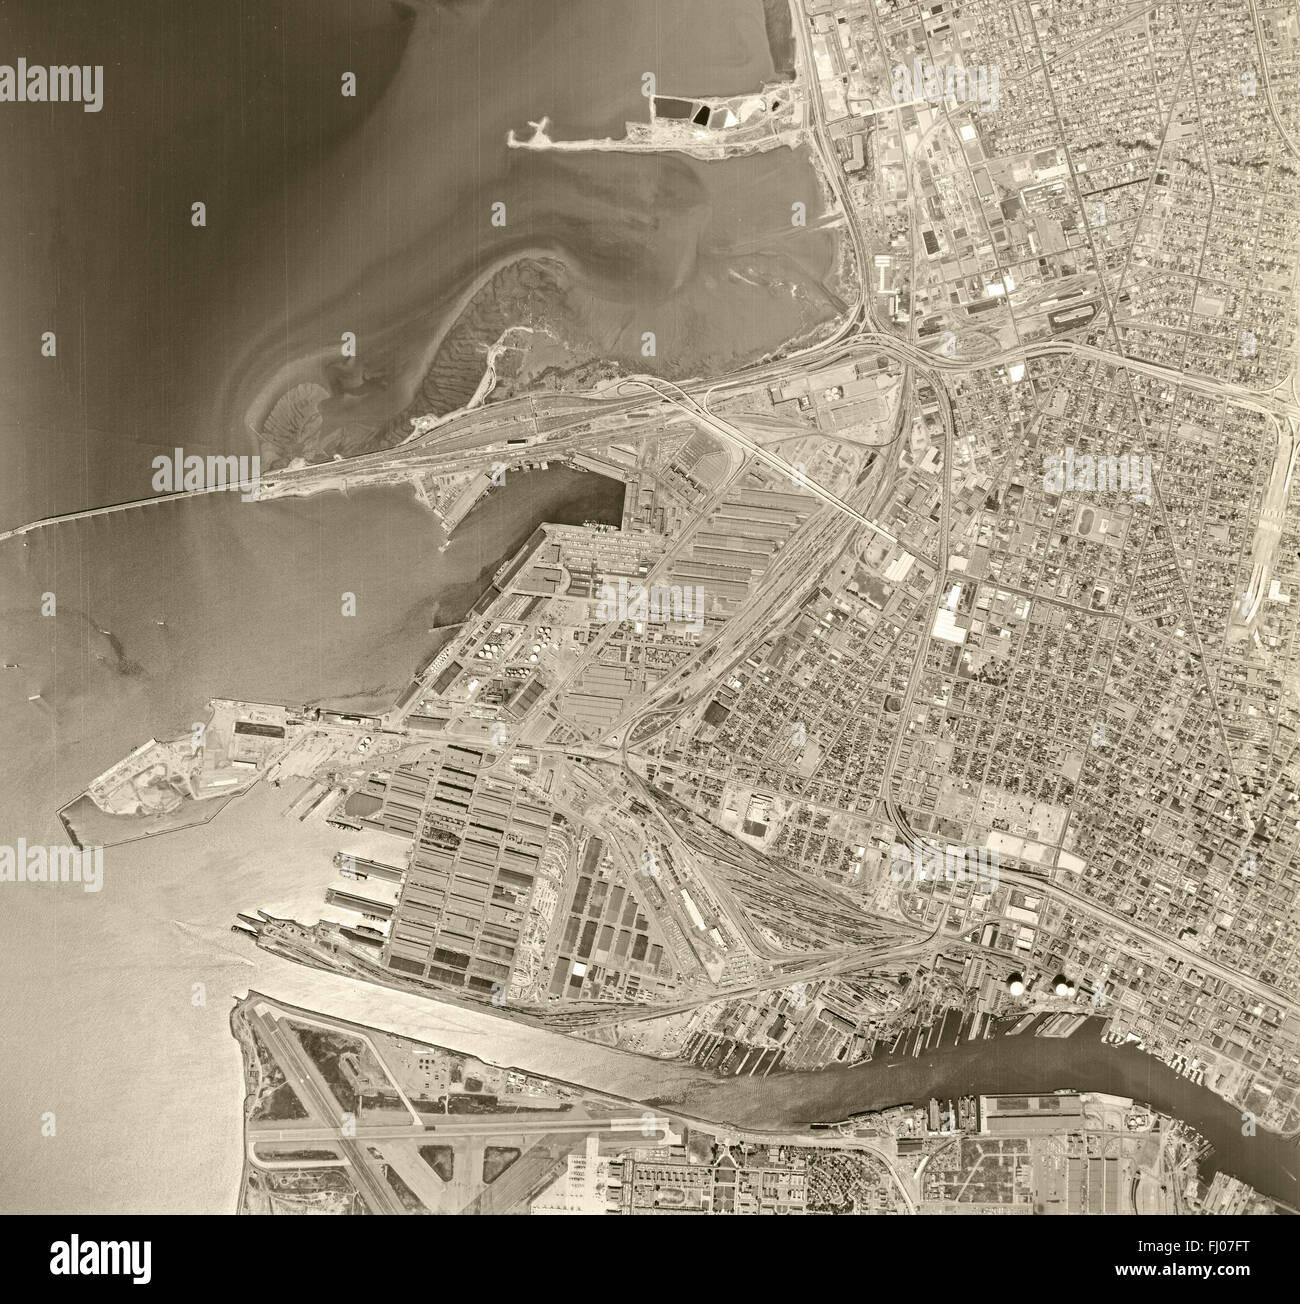 historical aerial photograph Oakland, California, 1968 - Stock Image